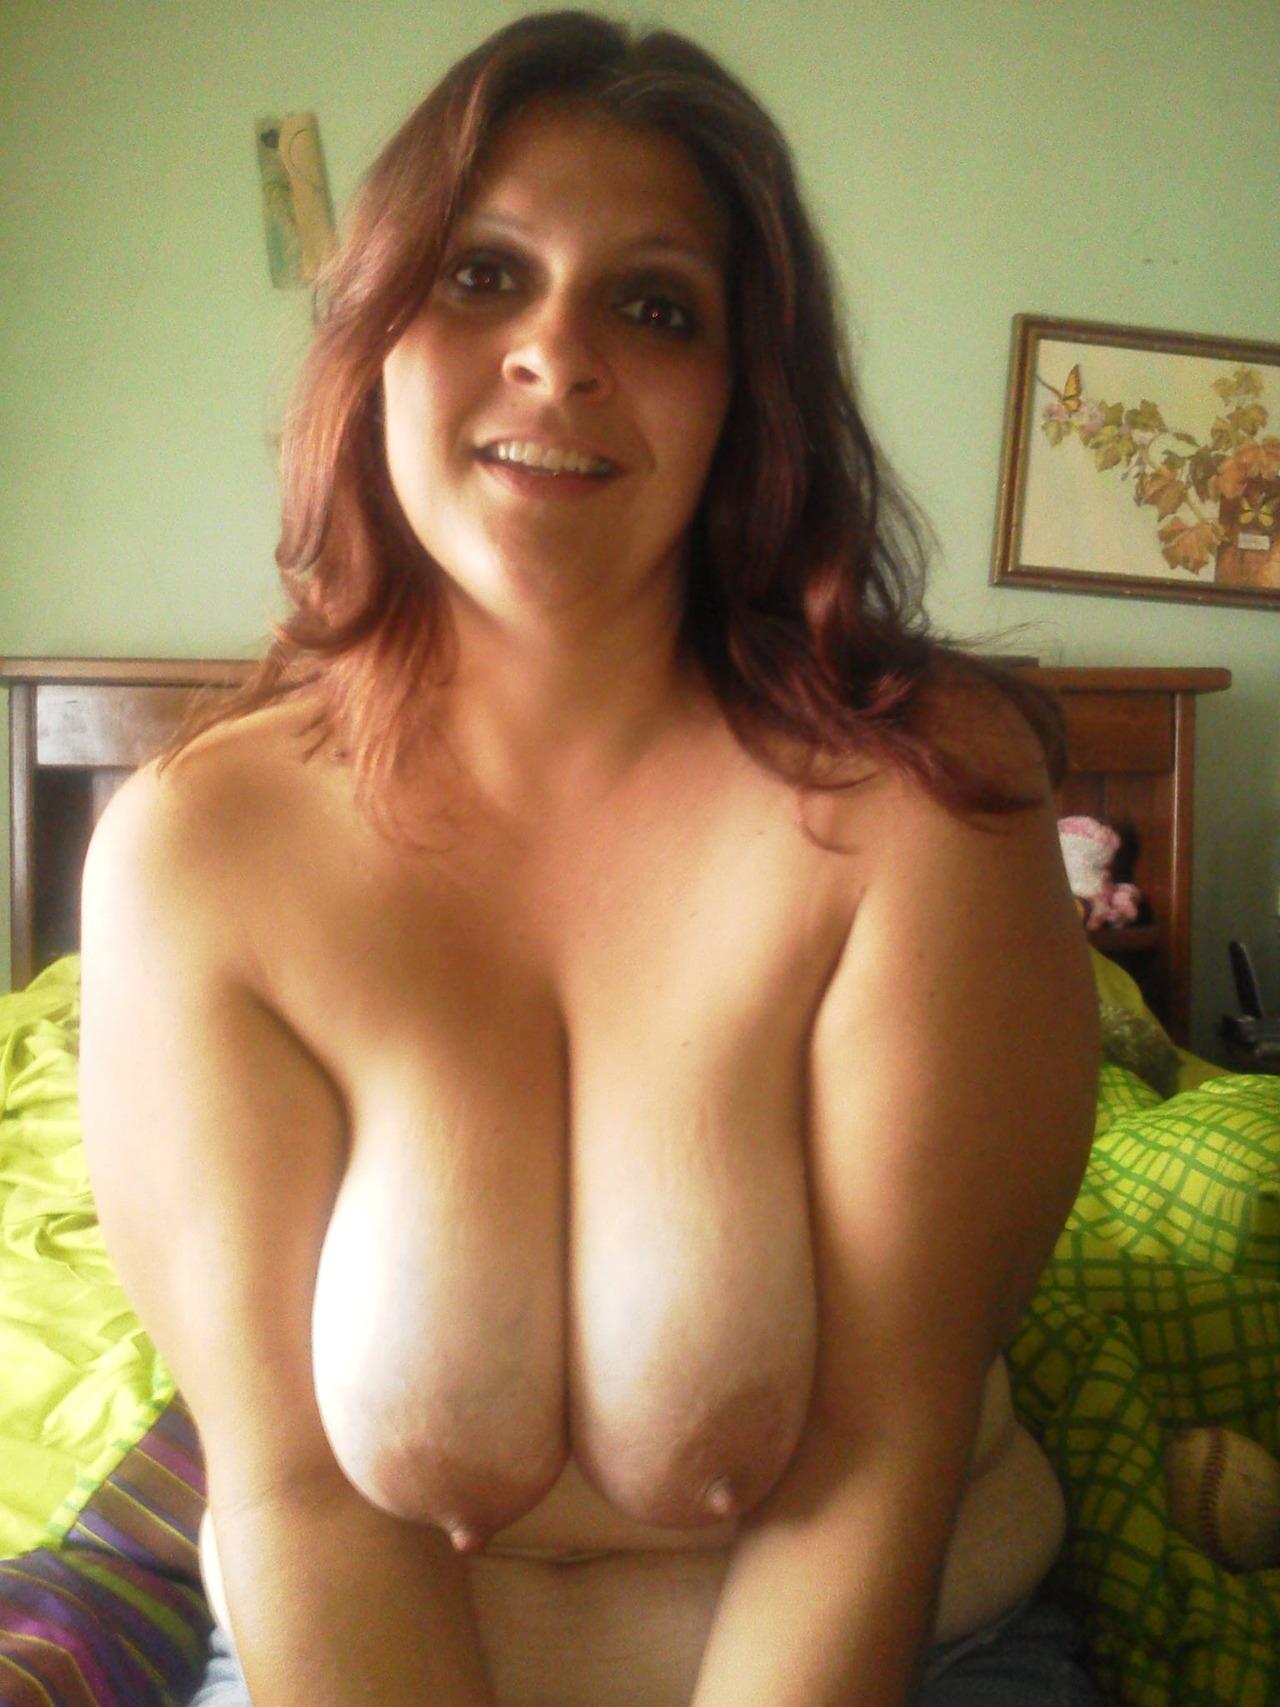 Big tit milf fucks young girl